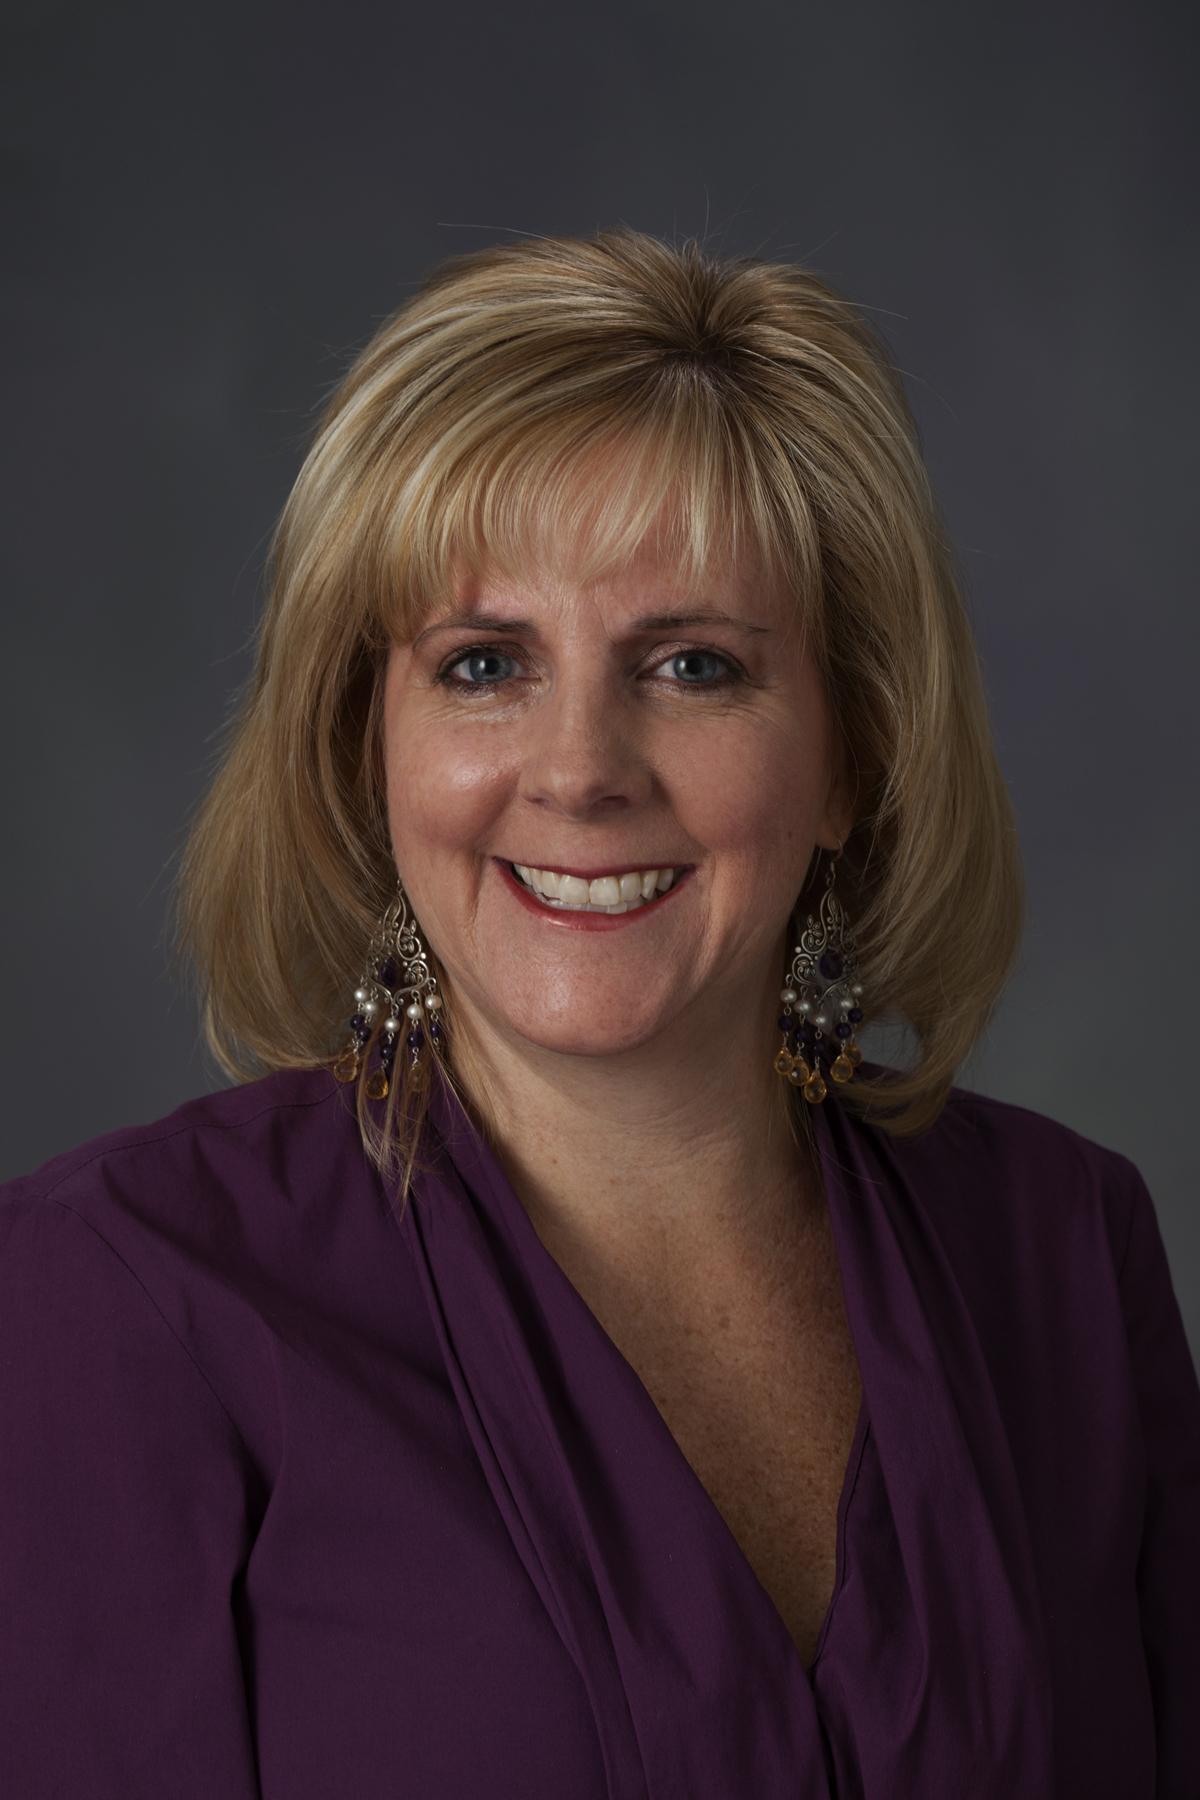 Ann Herrick, marketing director, Hallmark